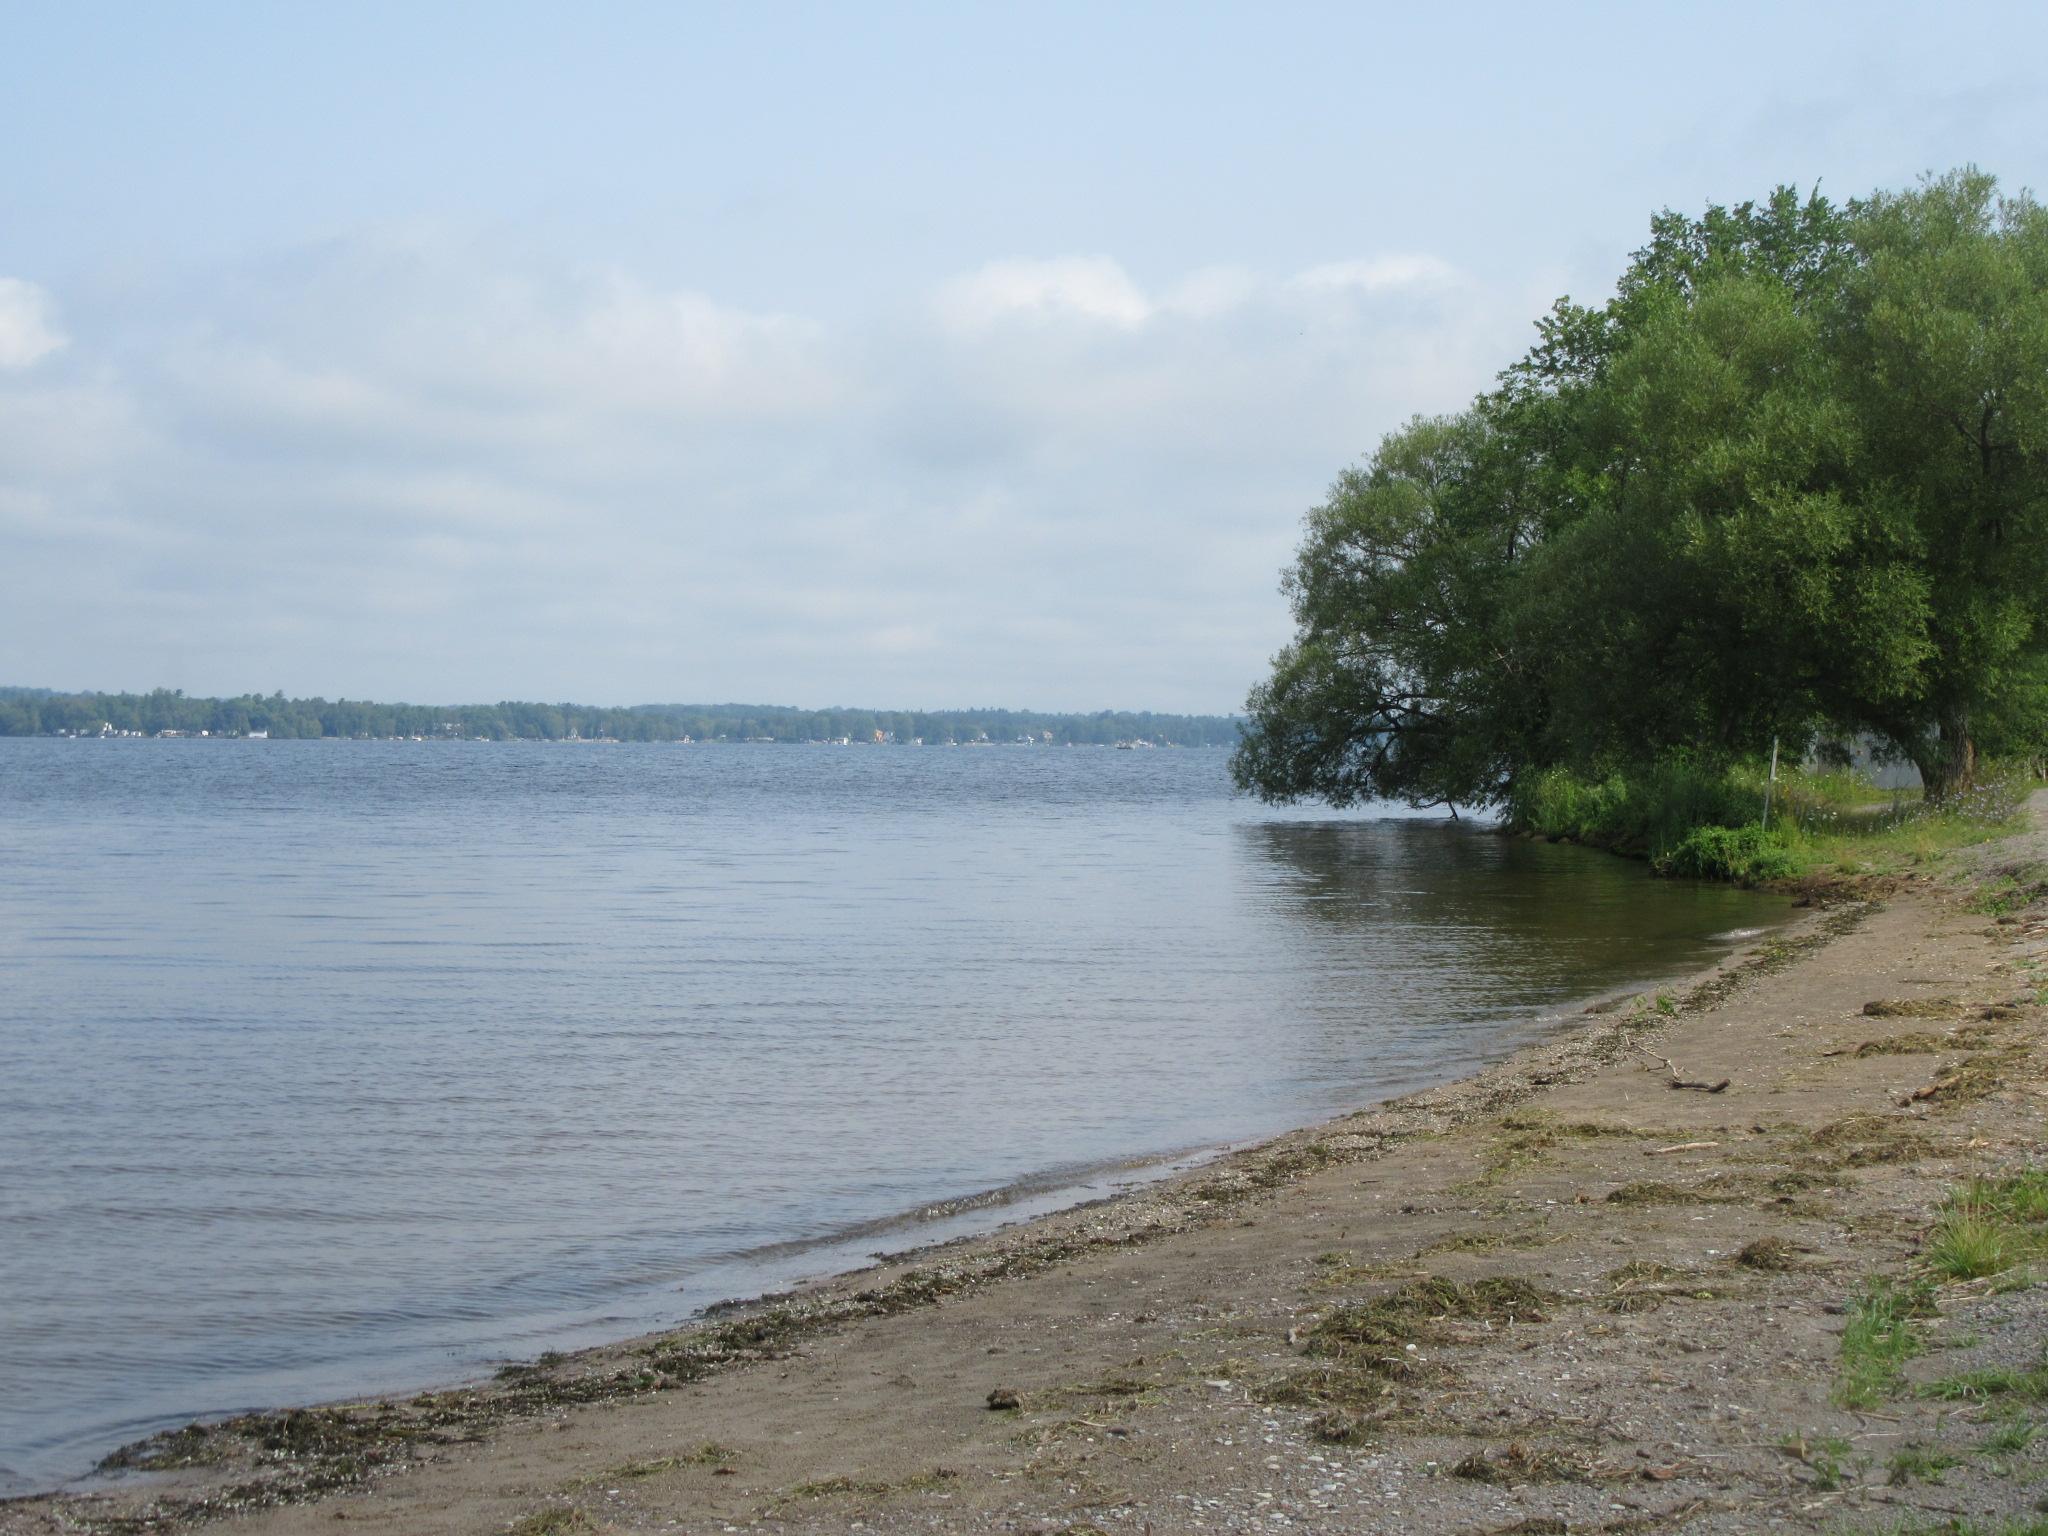 Hwy. 24 beach park